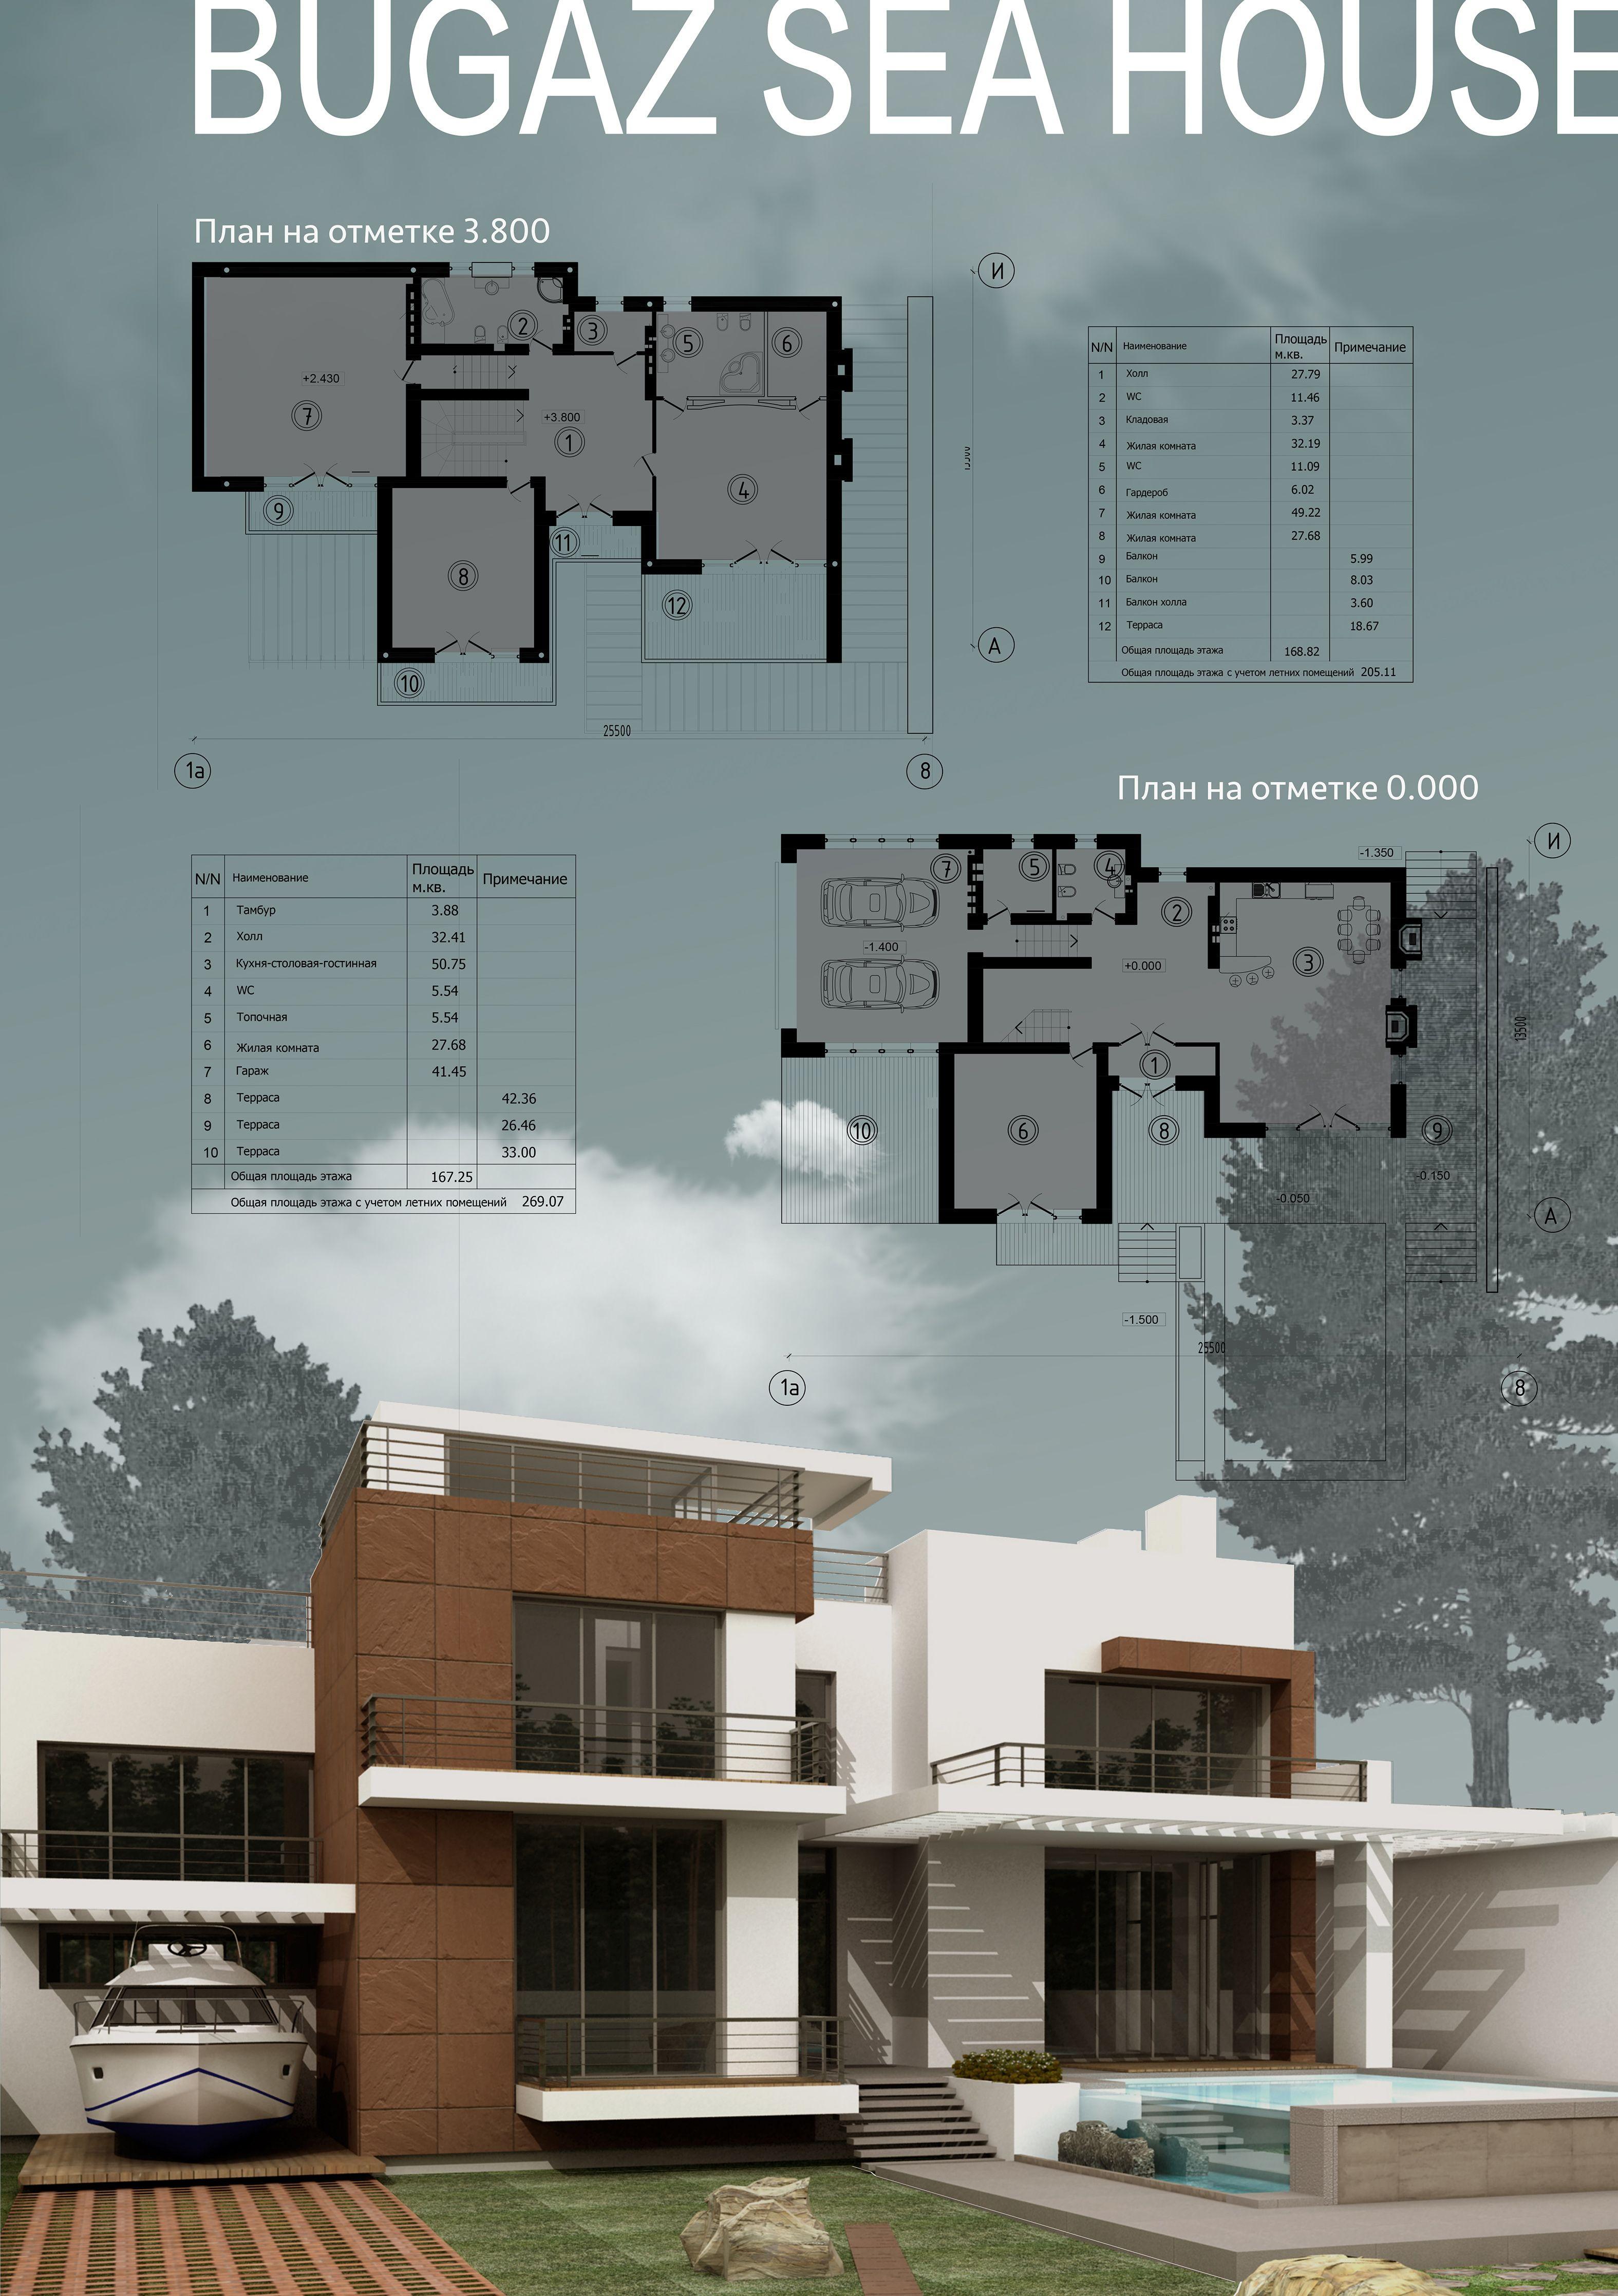 BUGAZ SEA HOUSE   Homes Ideas   Pinterest   Grundrisse, Architektur ...